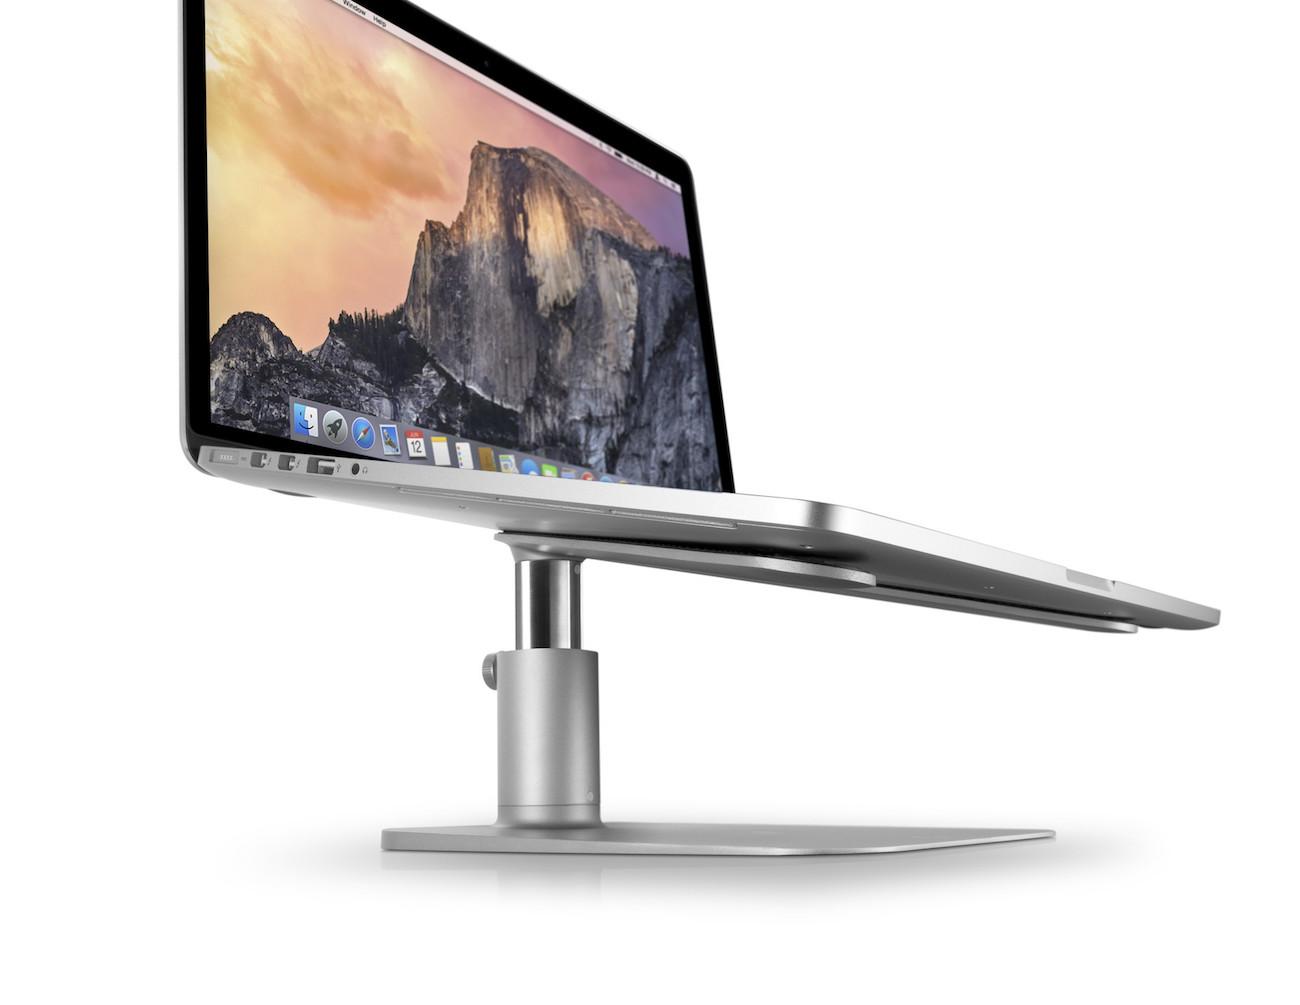 hirise-for-macbook-new-04